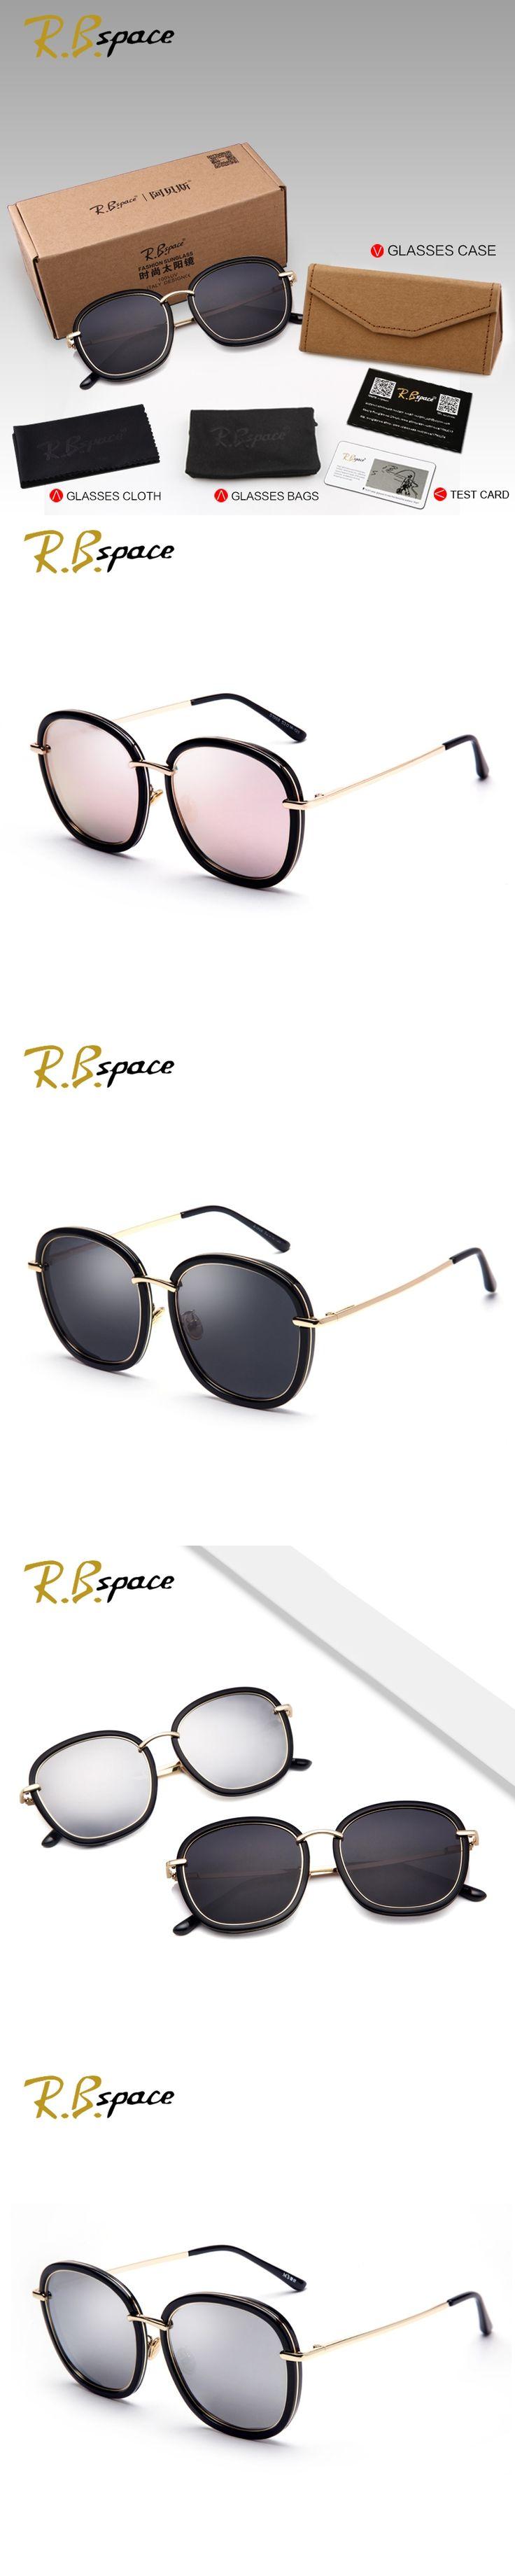 2017 New fashion polarized sunglasses ladies brand designer sunglasses men travel essential high quality sunglasses woman UV400